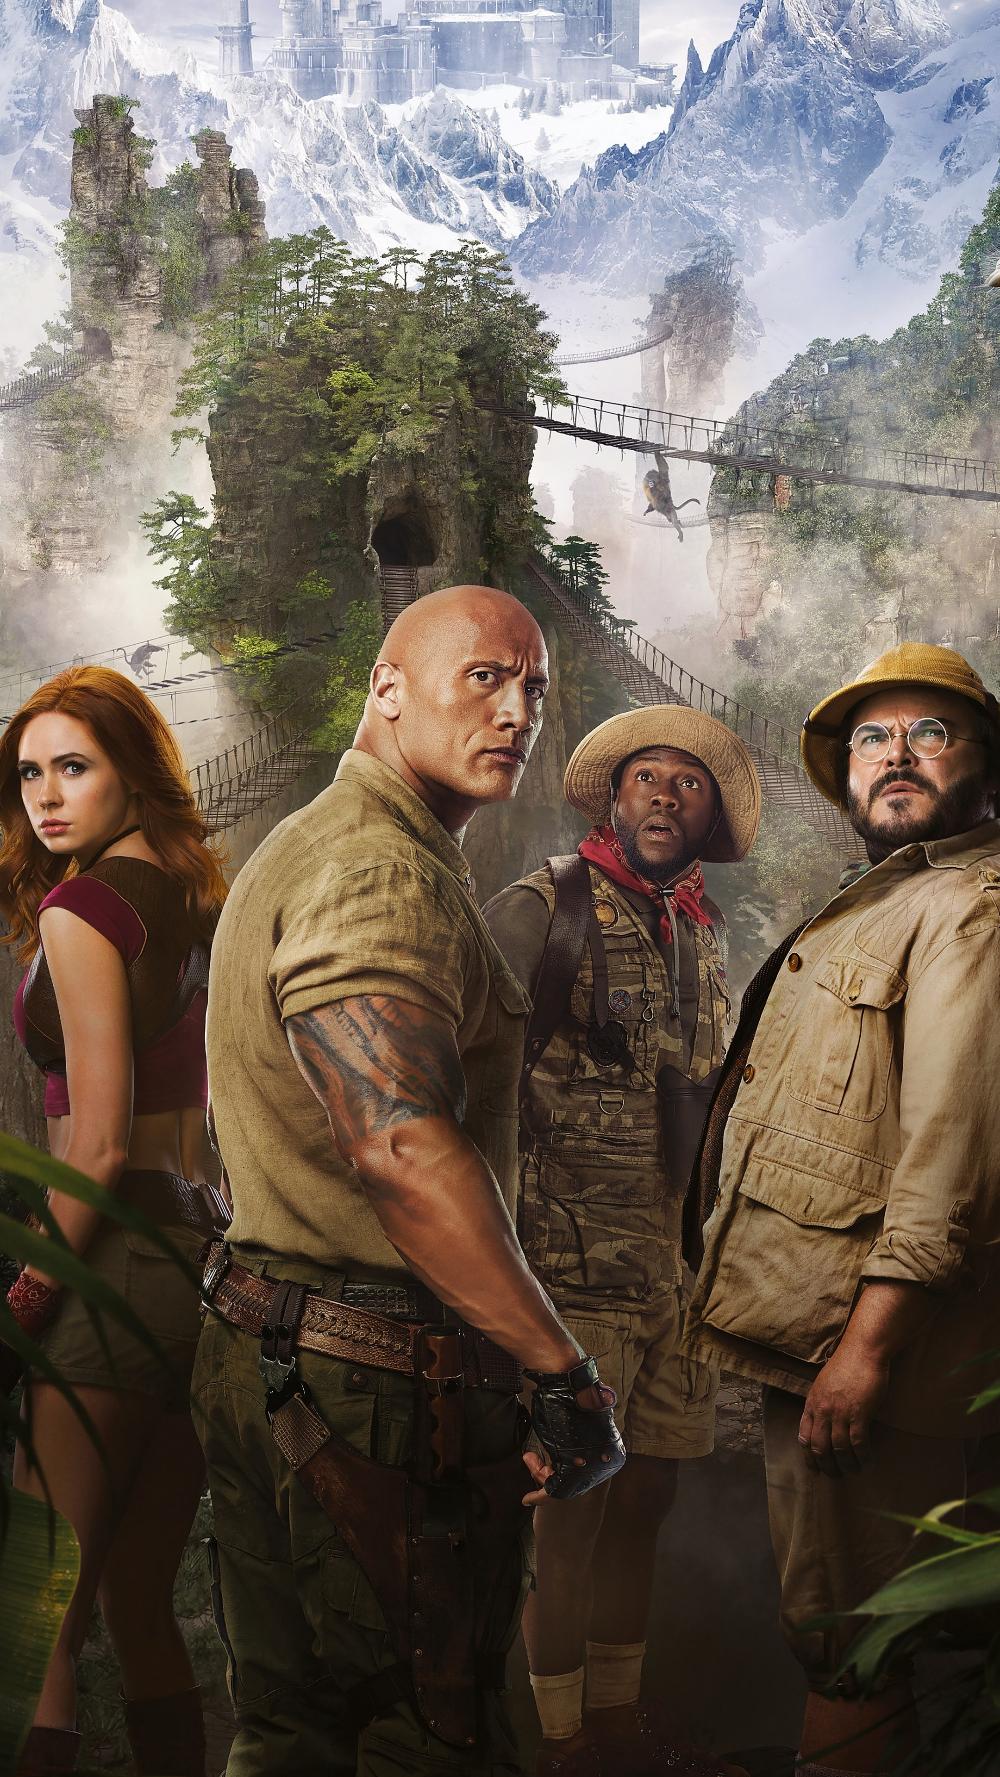 Jumanji: The Next Level, Kevin Hart, Dwayne Johnson, adventure movie, 2019, 2160x3840 wallpaper